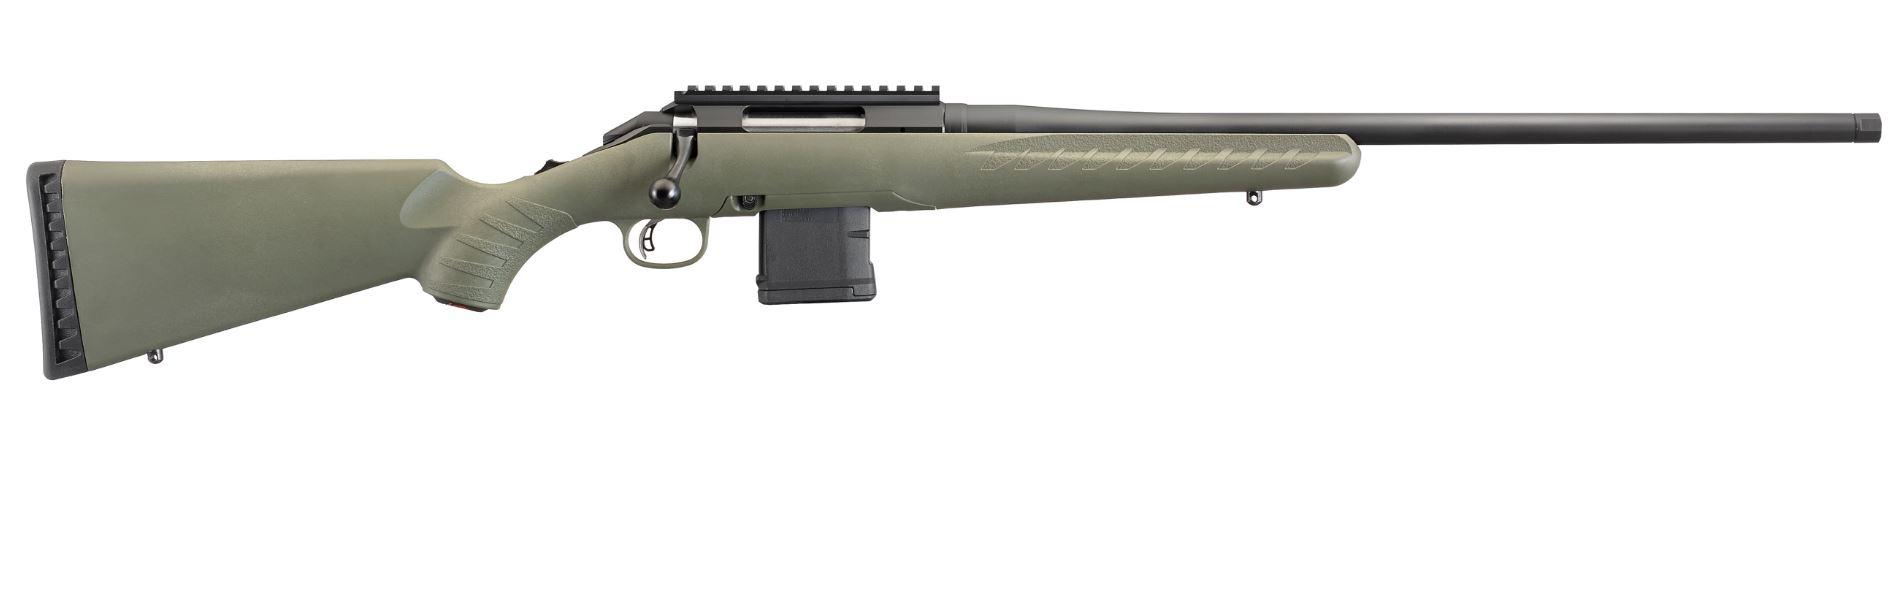 Ruger American Predator Rifle 223 Rem